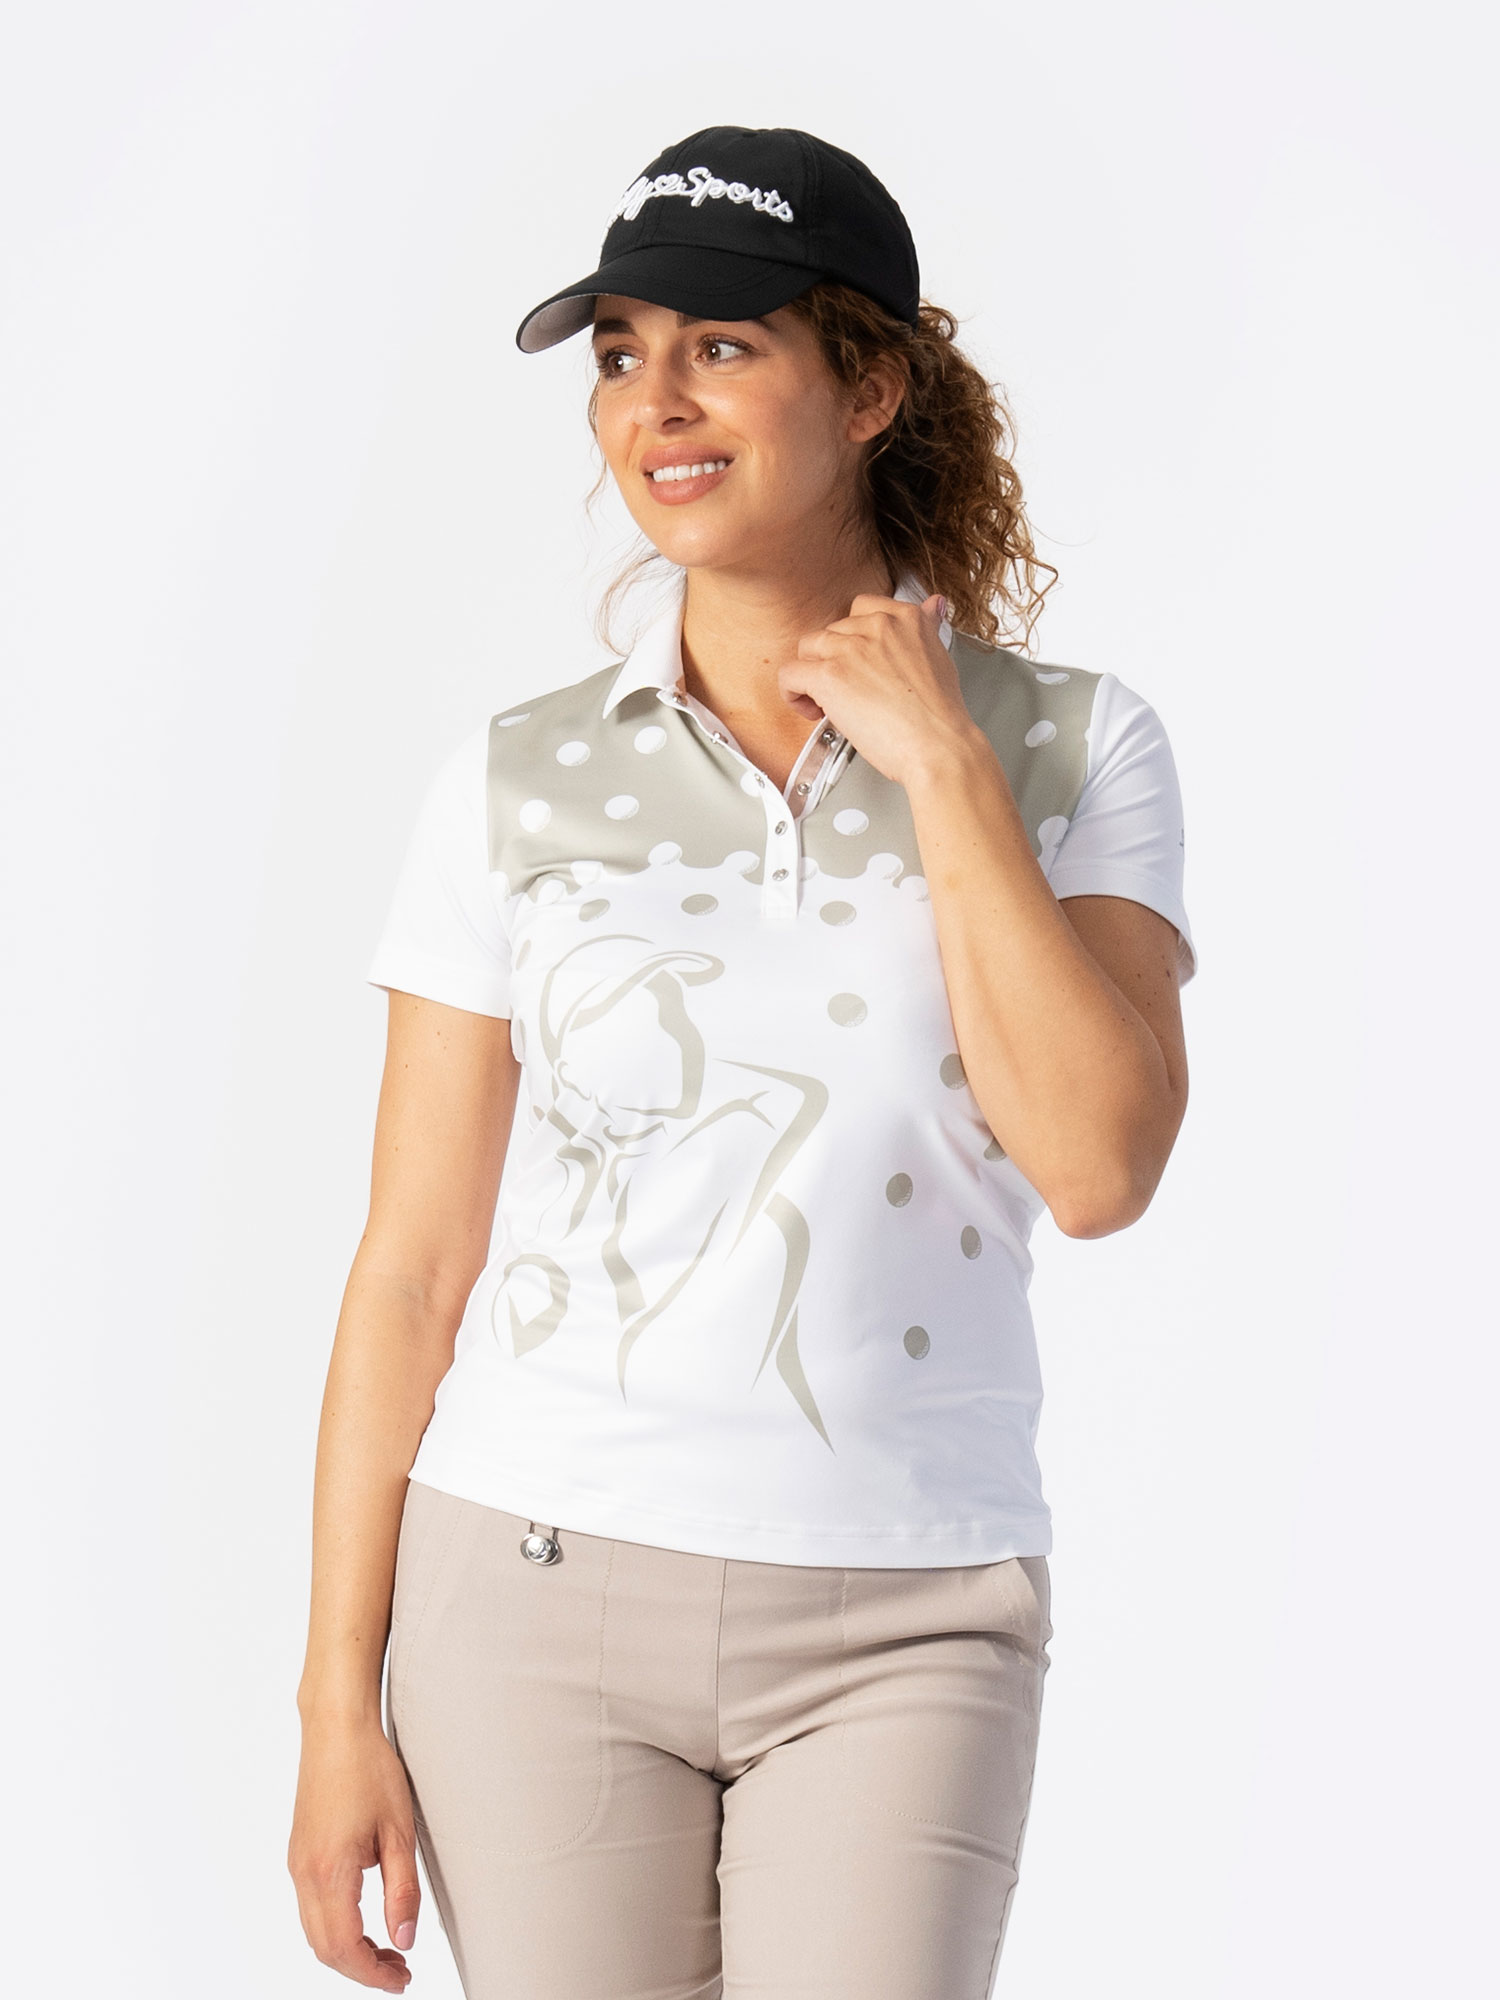 Aim Short-sleeved Polo Shirt